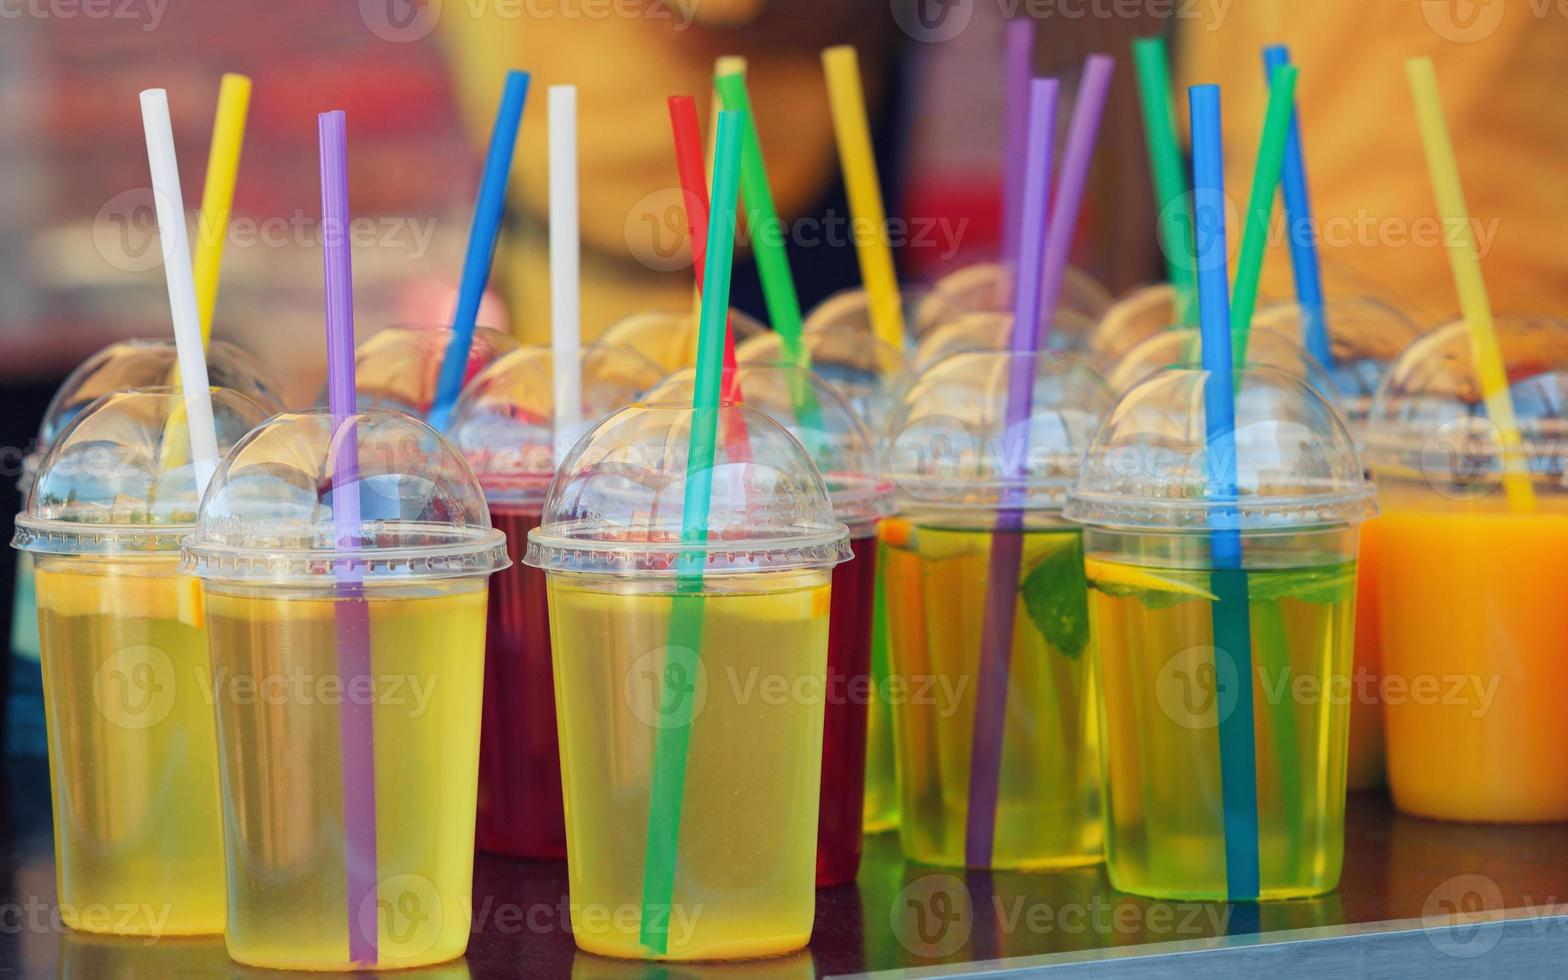 lebhaftes Getränk in Plastikgläsern foto